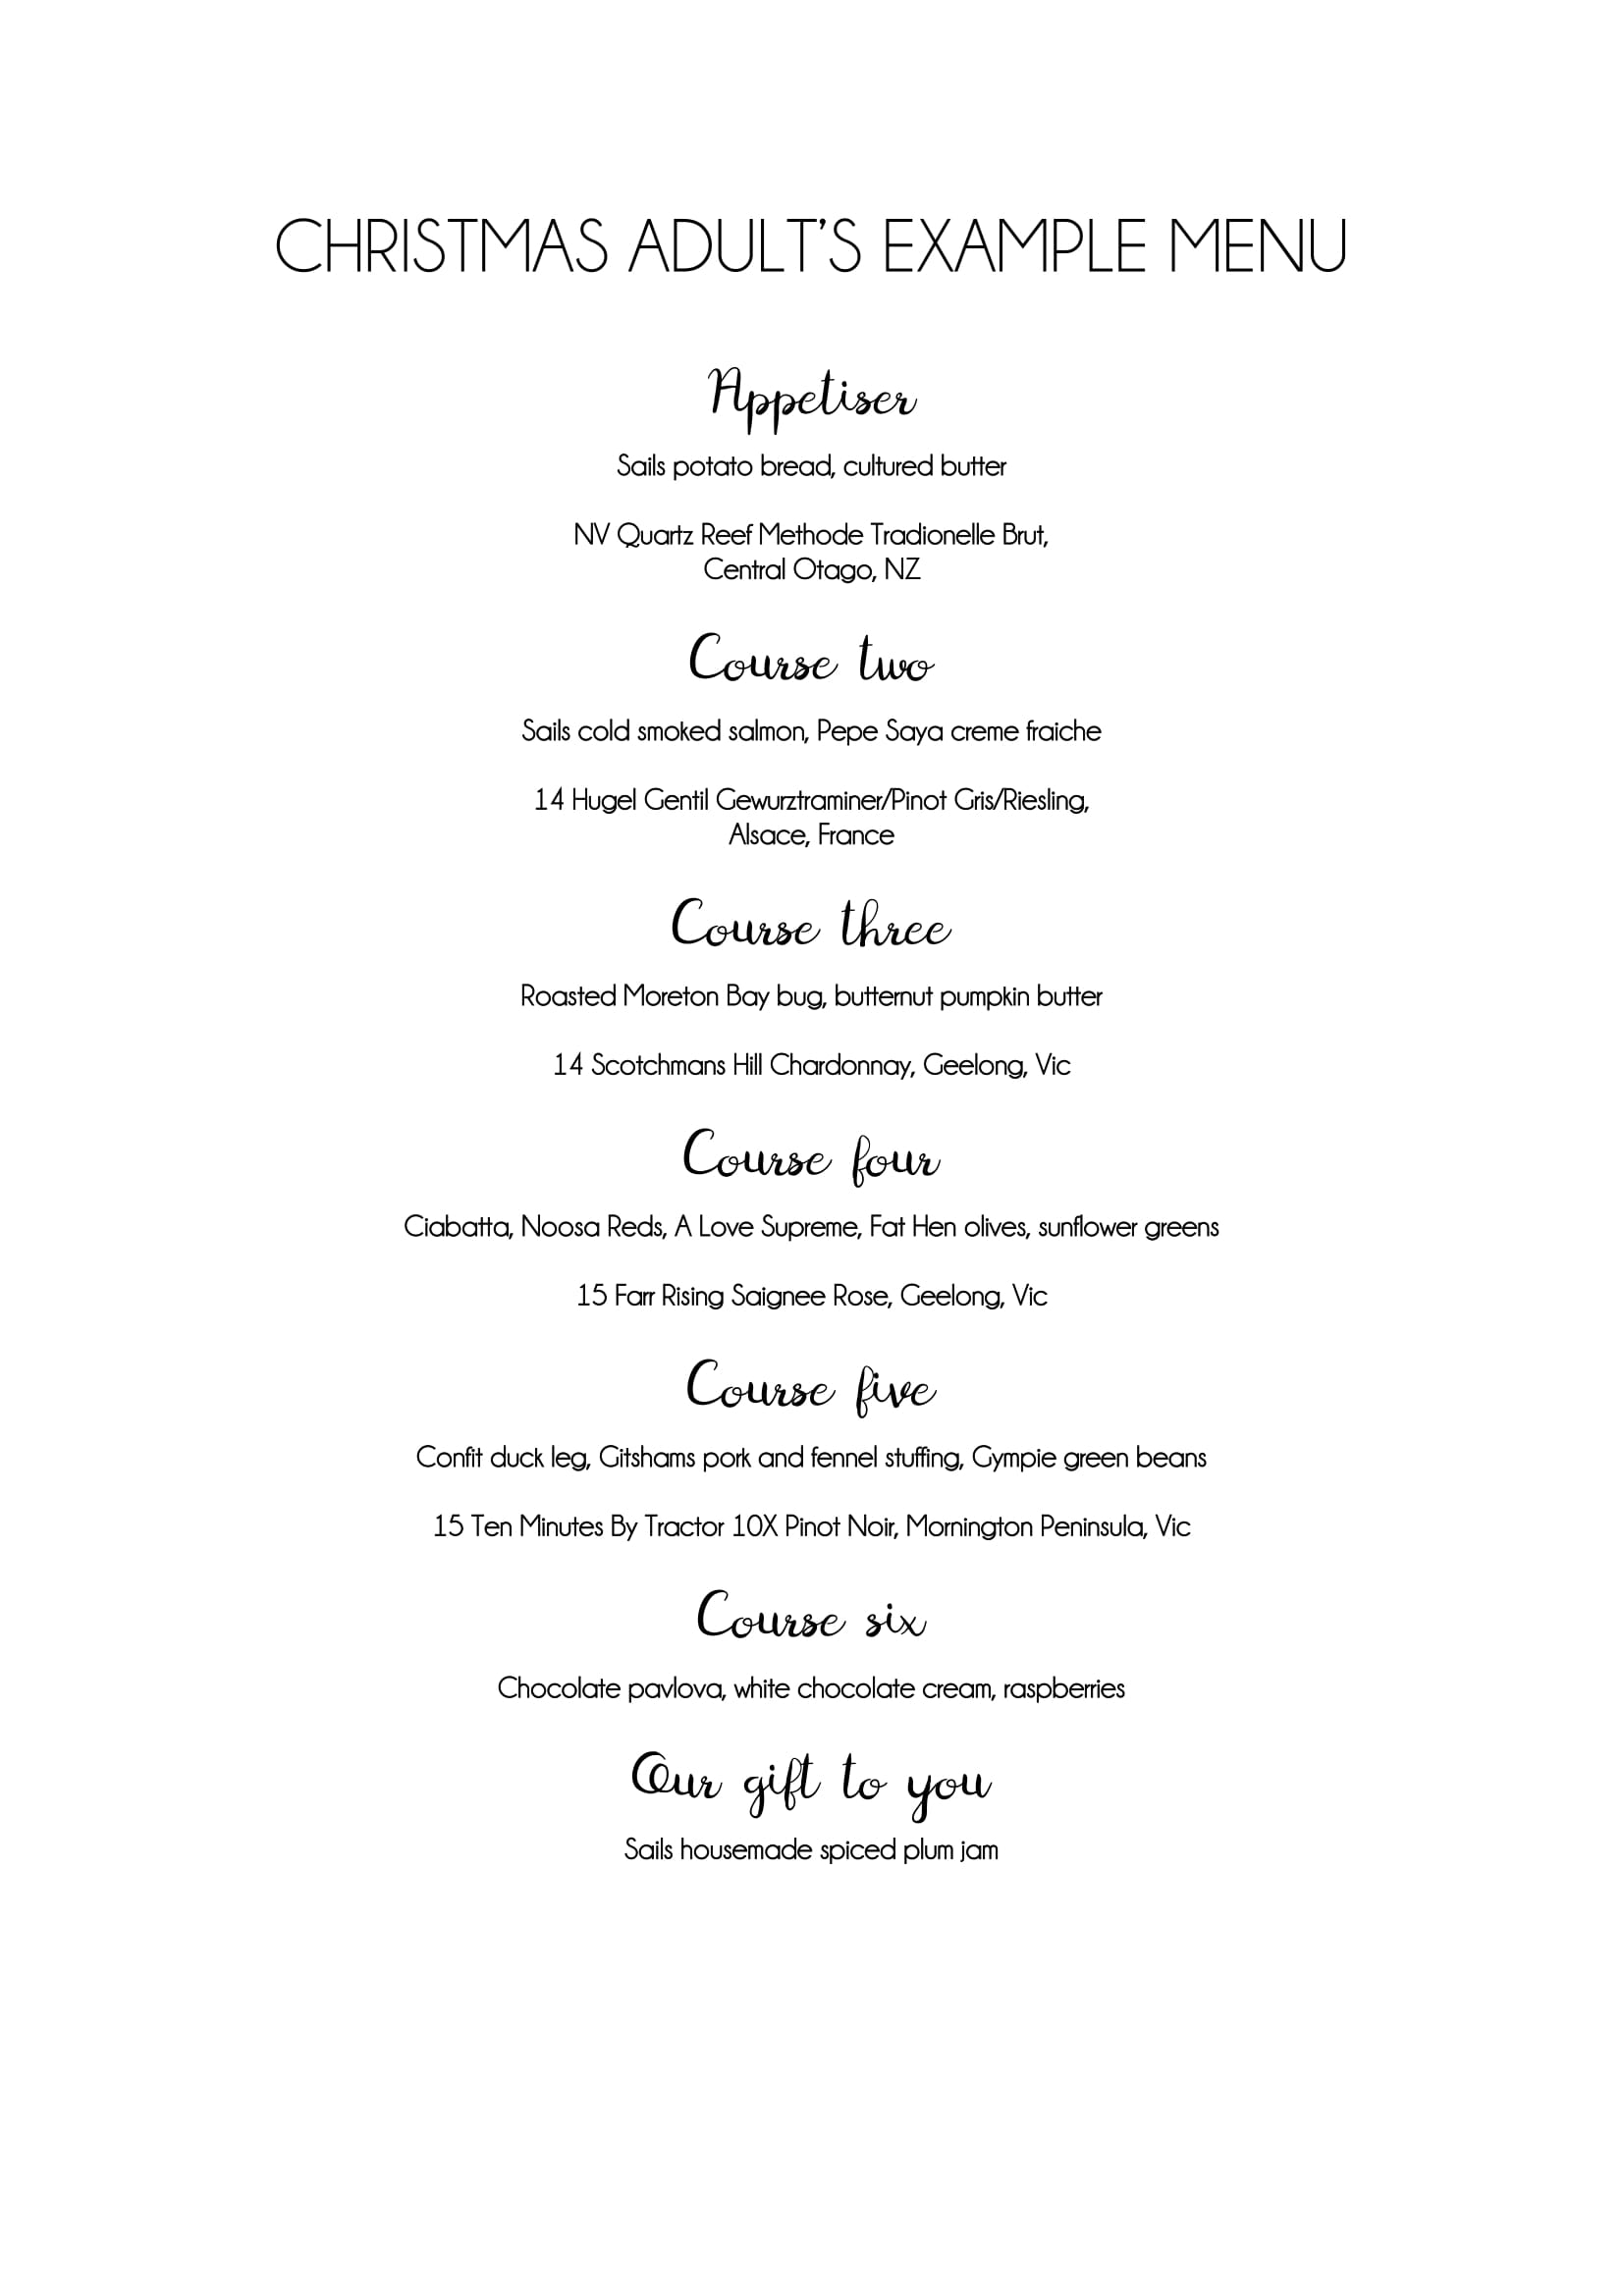 CHRISTMAS ADULT example menu-1